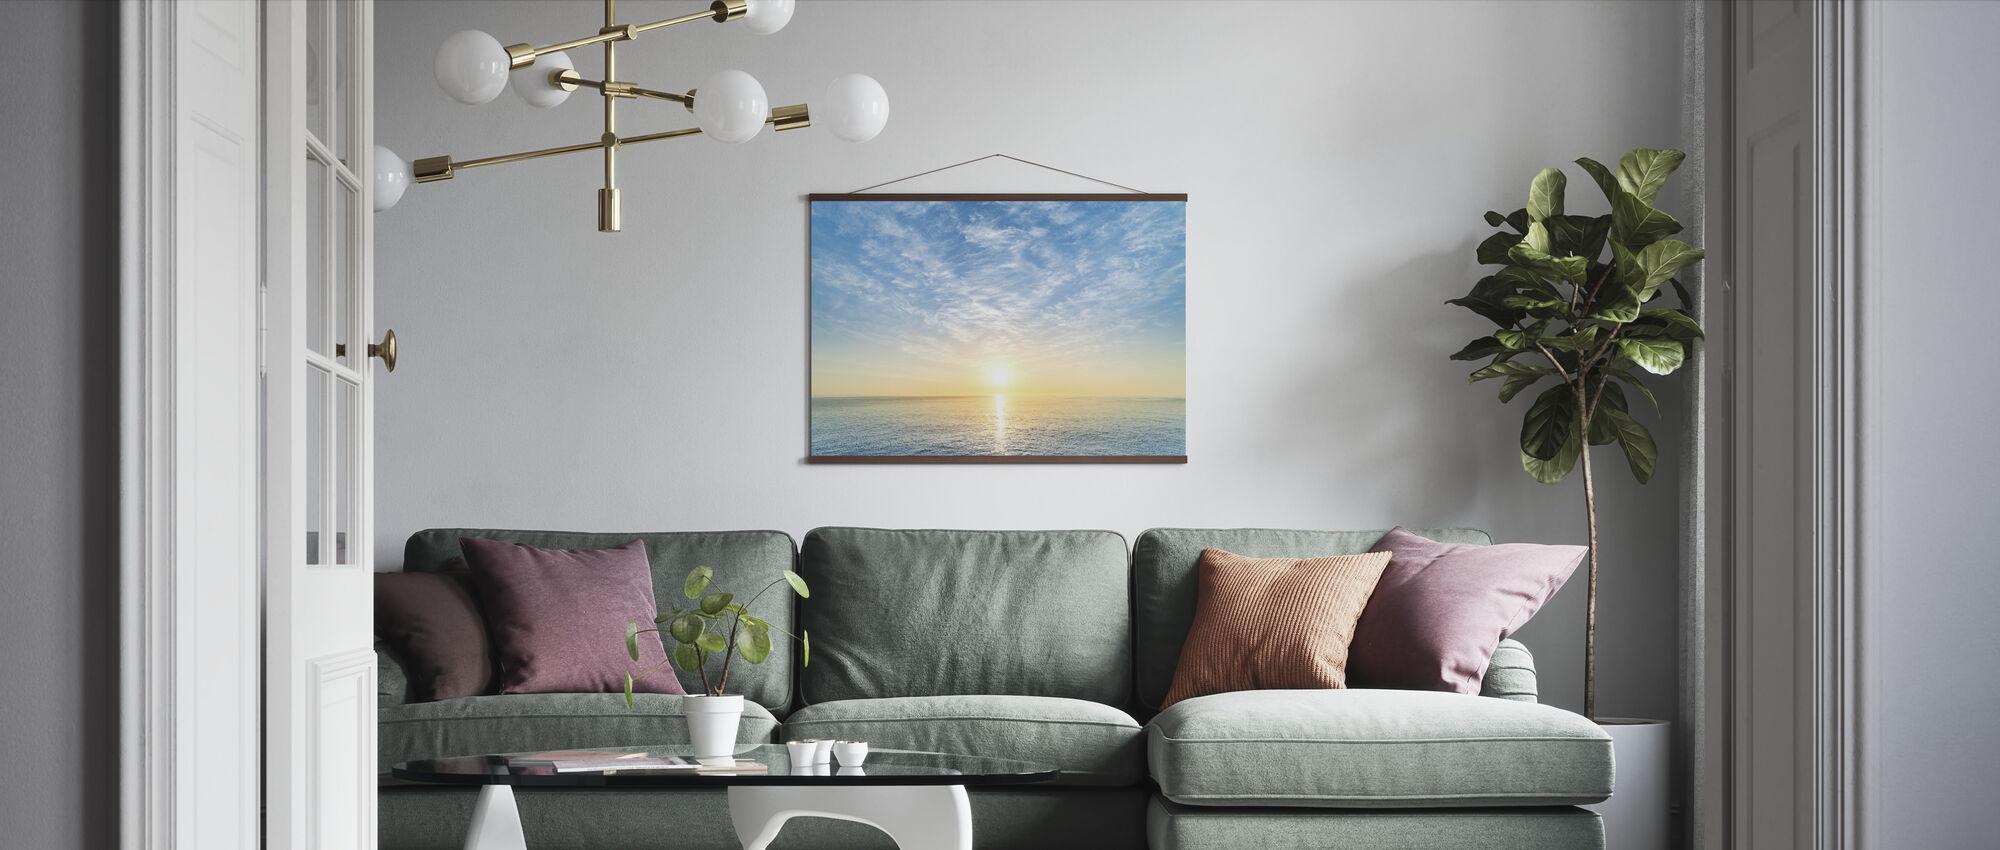 Zonsopgang aan zee - Poster - Woonkamer